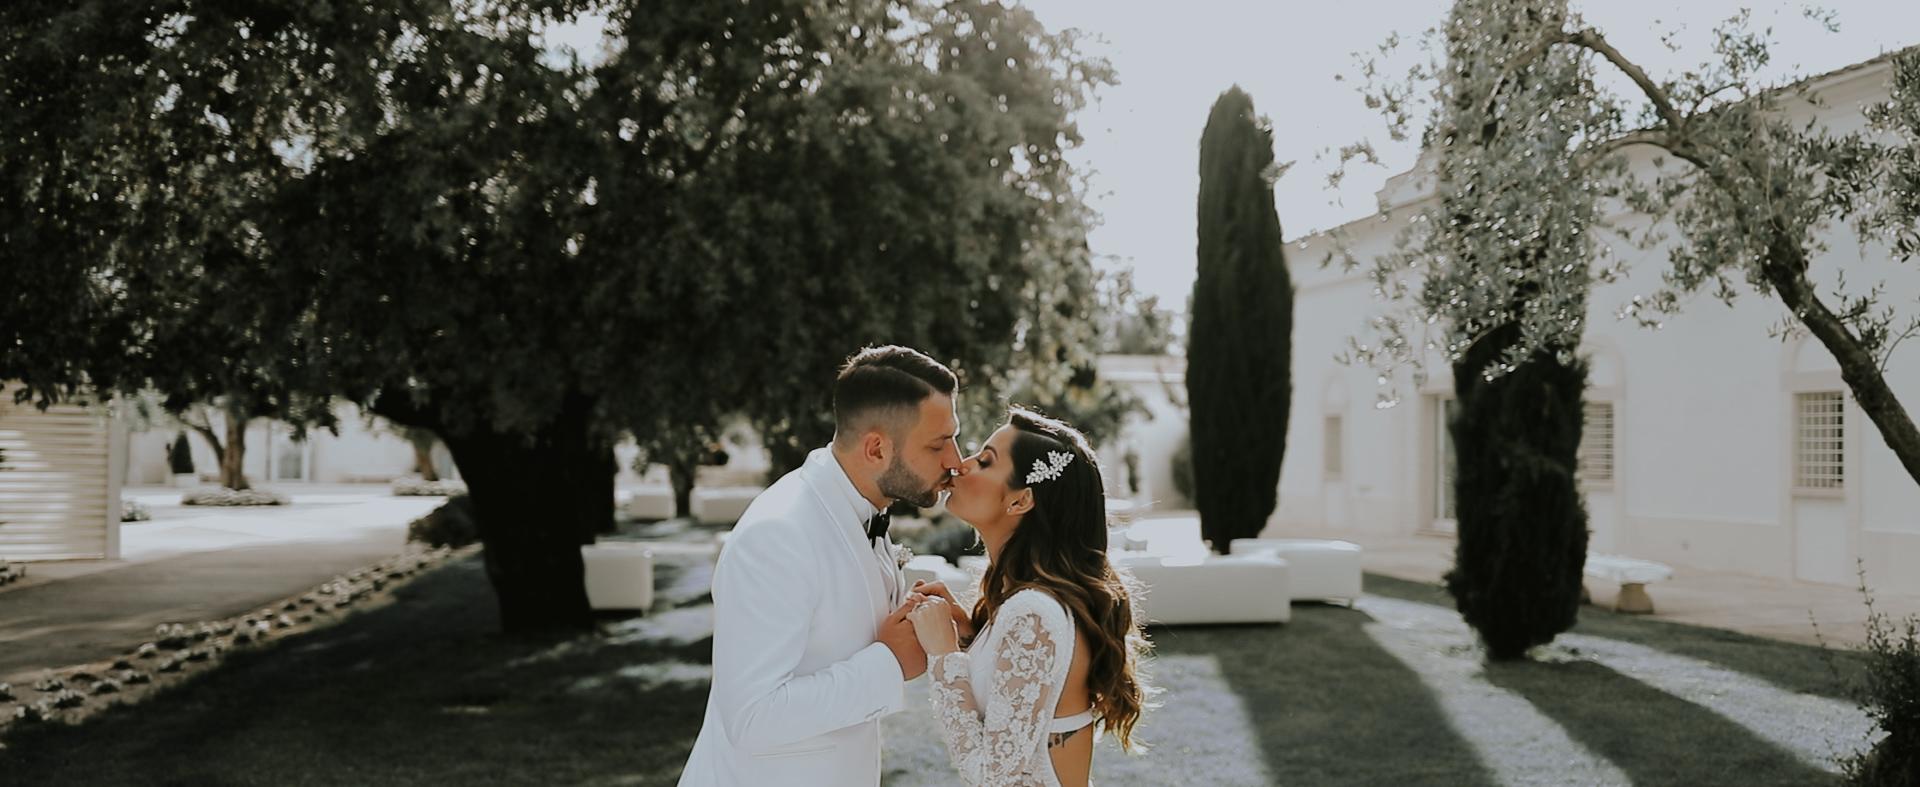 federico-cardone-alessia-macari-video-matrimonio-videografo-2 Matrimonio Alessia Macari & Oliver Kragl